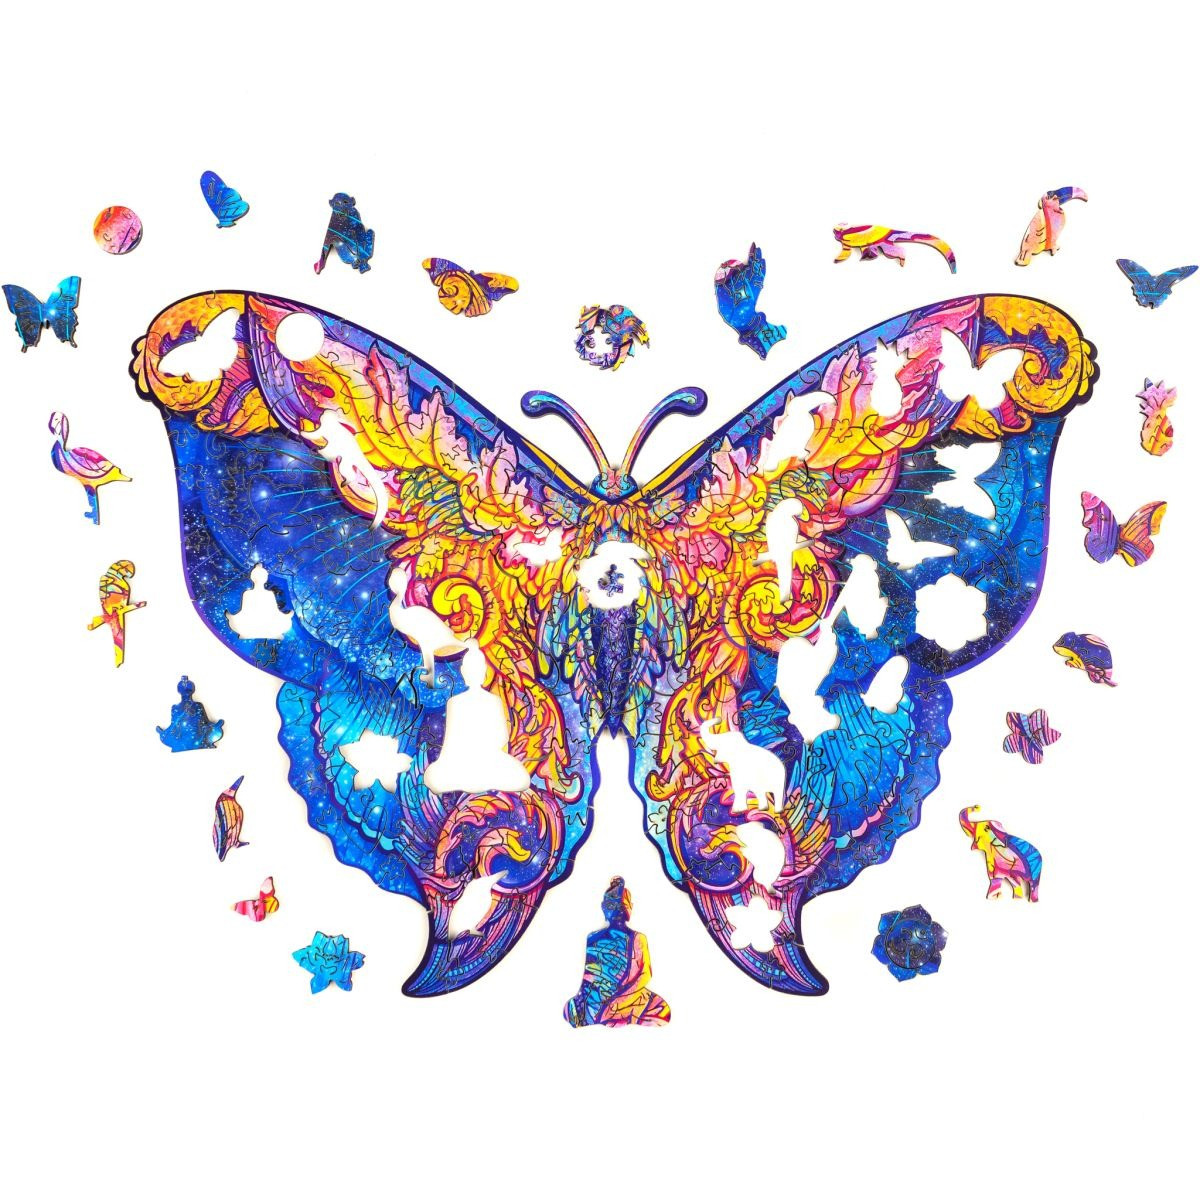 "Дерев'яні фігурні пазли ""Wooden jigsaw puzzle of Galactic Butterfly"" А5, дерев'яний пазл Метелик (NS)"